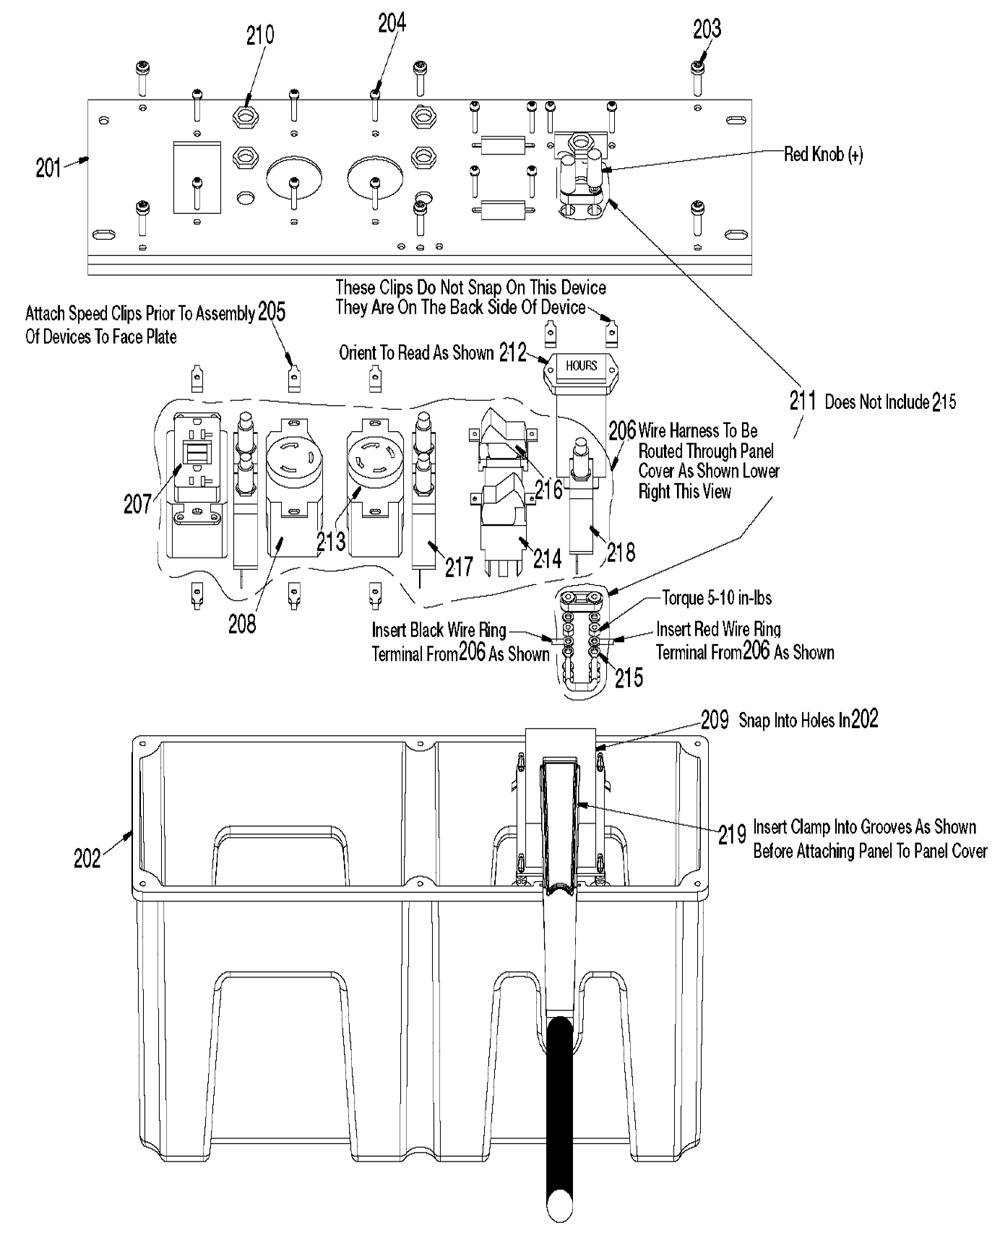 H451CS-W-Portercable-PB-2Break Down